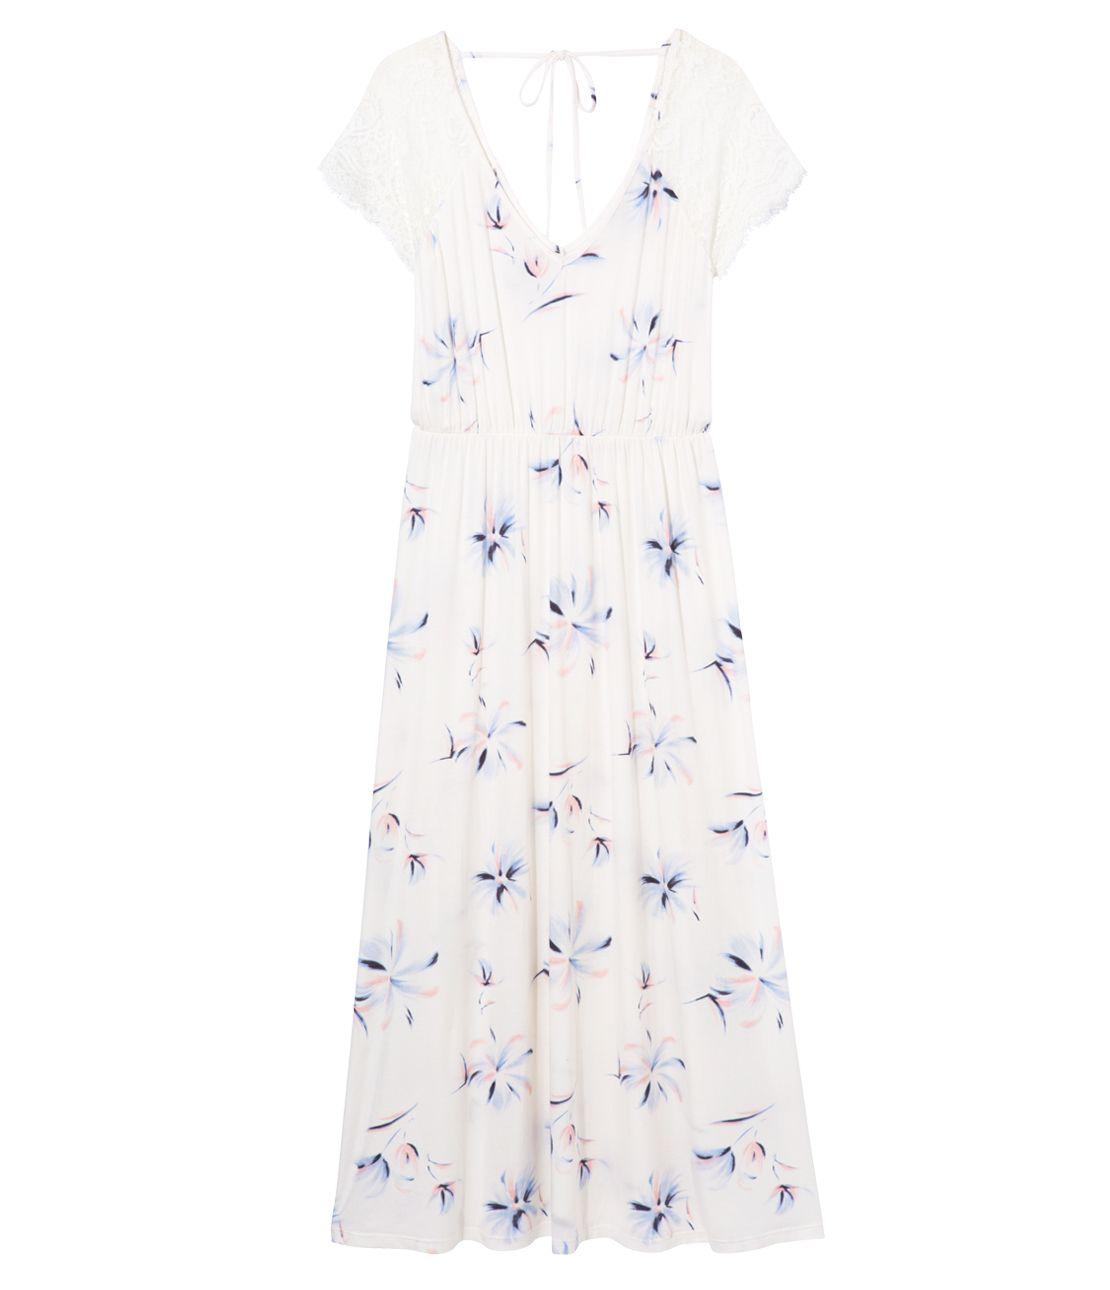 Micro Modal (R) long dress